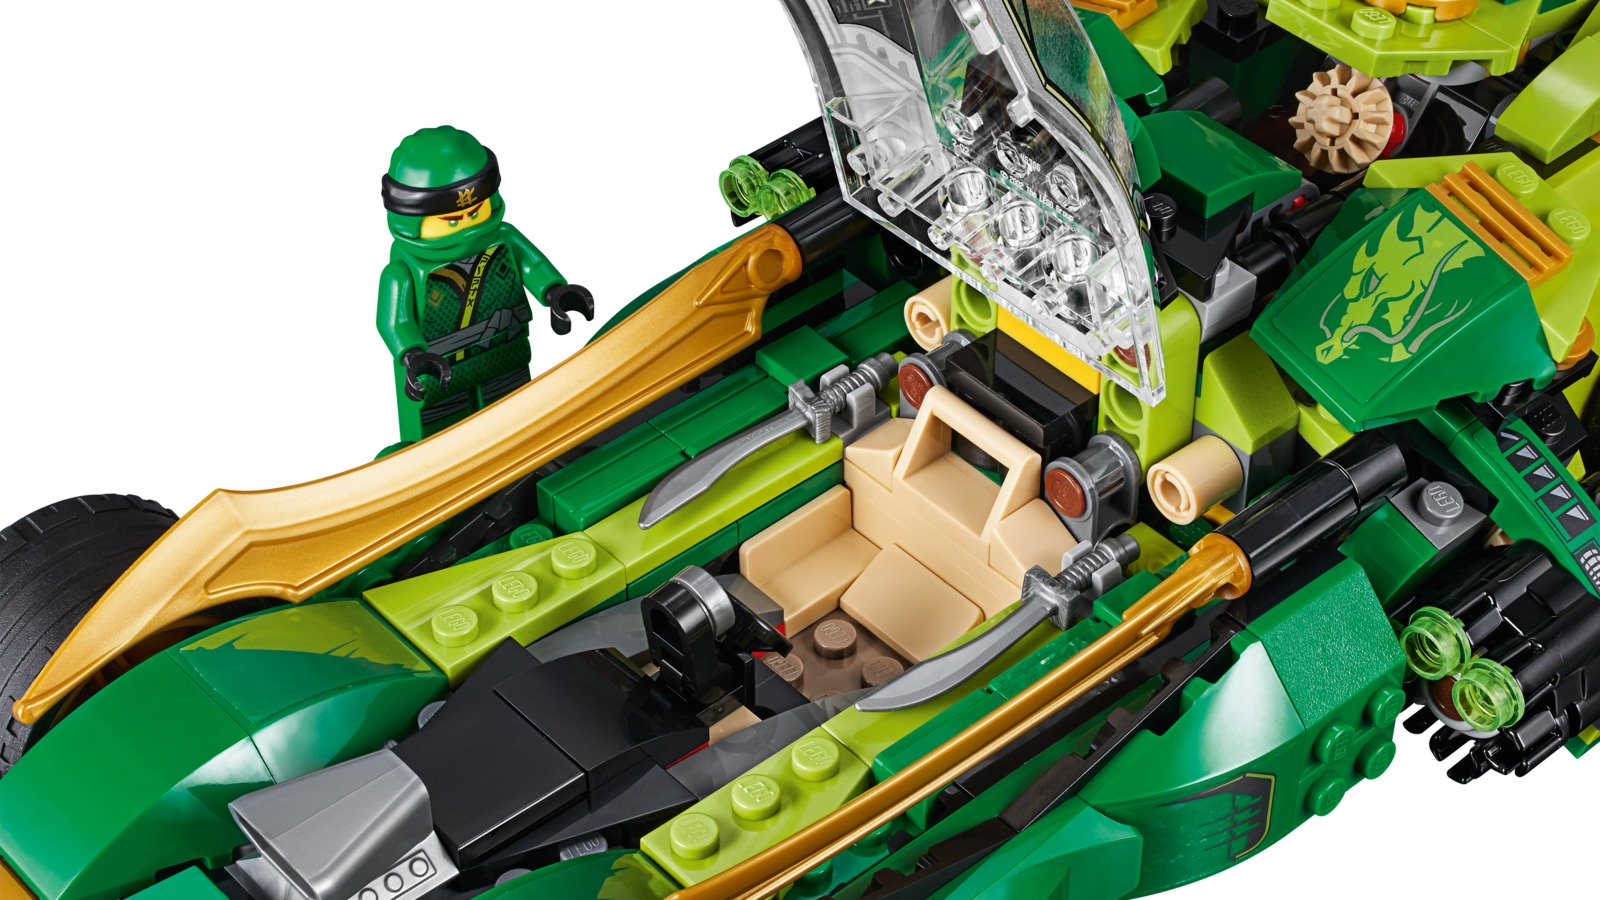 Lego Ninjago Ninja Nightcrawler 70641 Toy At Mighty Ape Nz